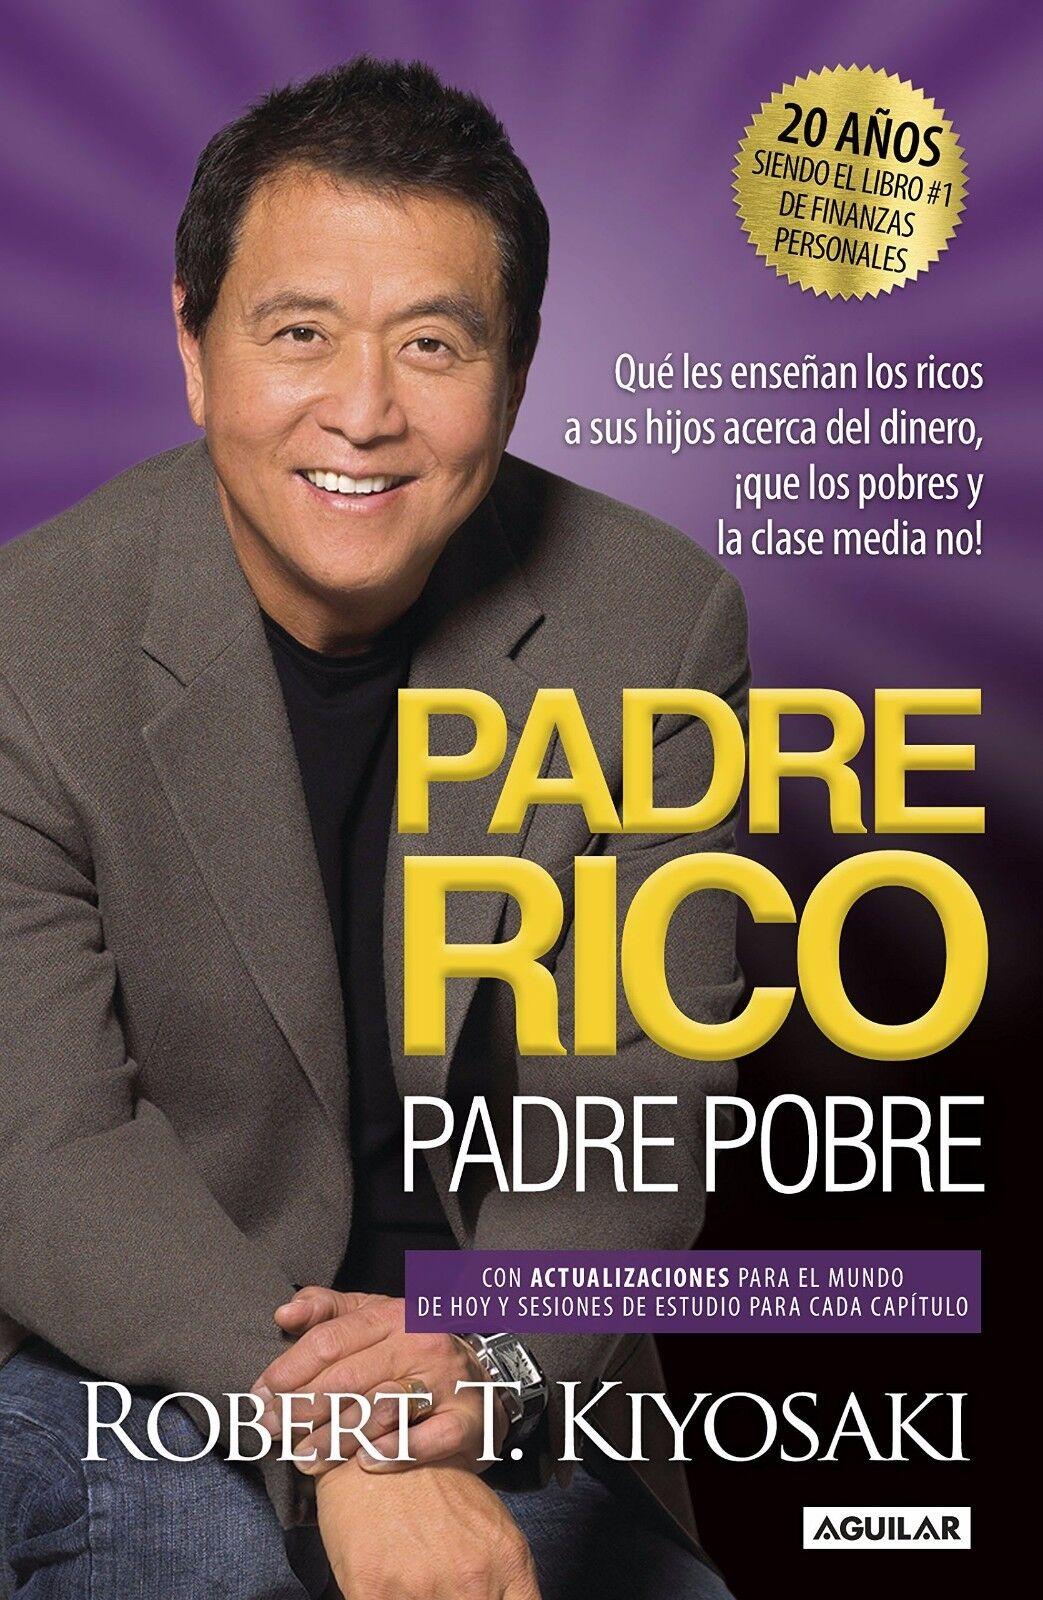 Padre Rico Padre Pobre Rich Dad Poor Dad Spanish